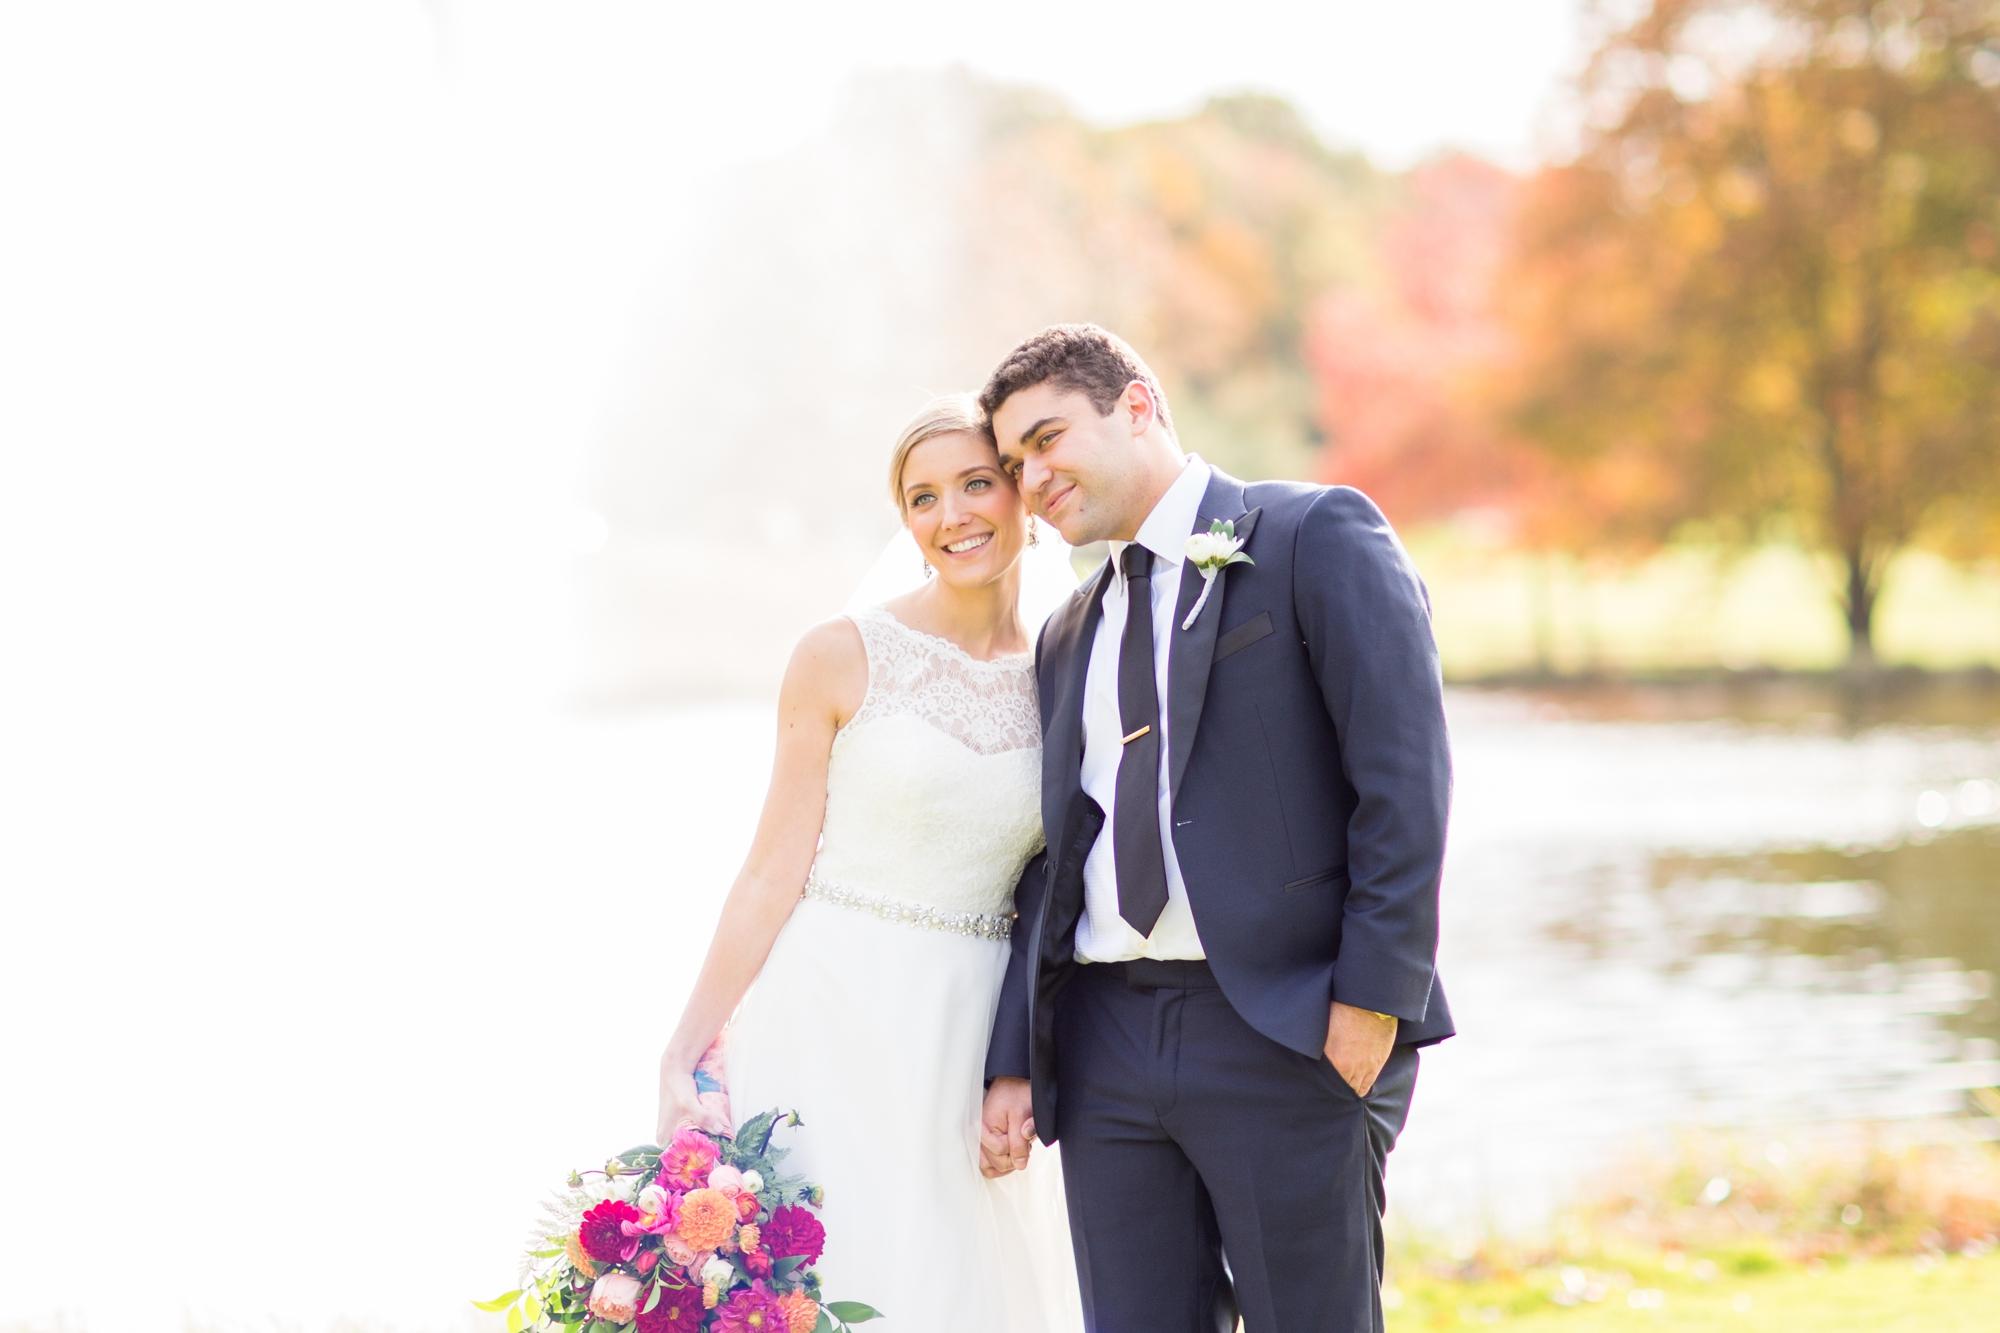 2-Finkel Wedding Bride & Groom Portraits-331_anna grace photography maryland wedding photographer turf valley.jpg